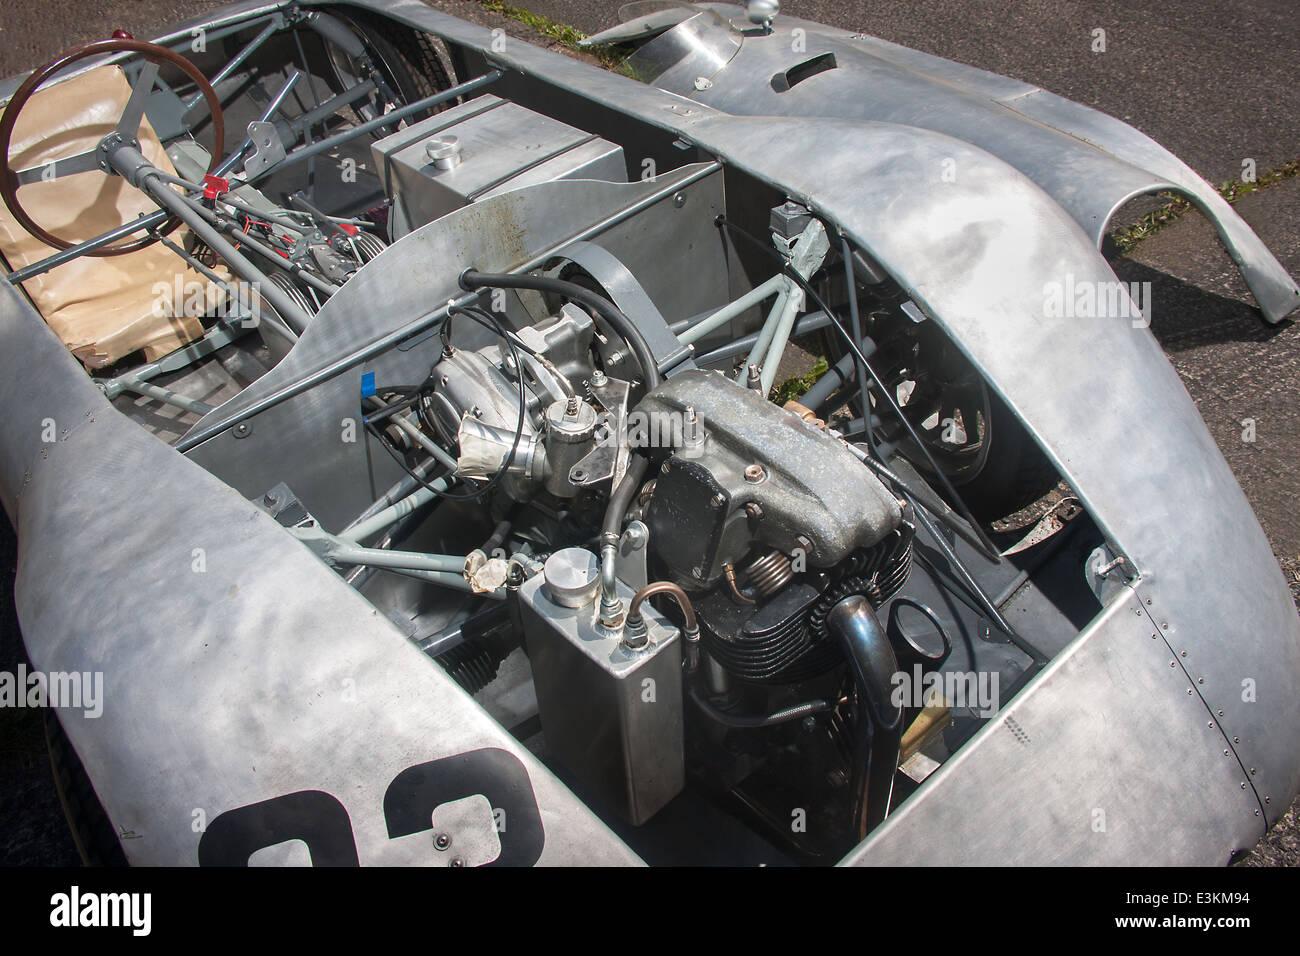 East Side Auto Parts